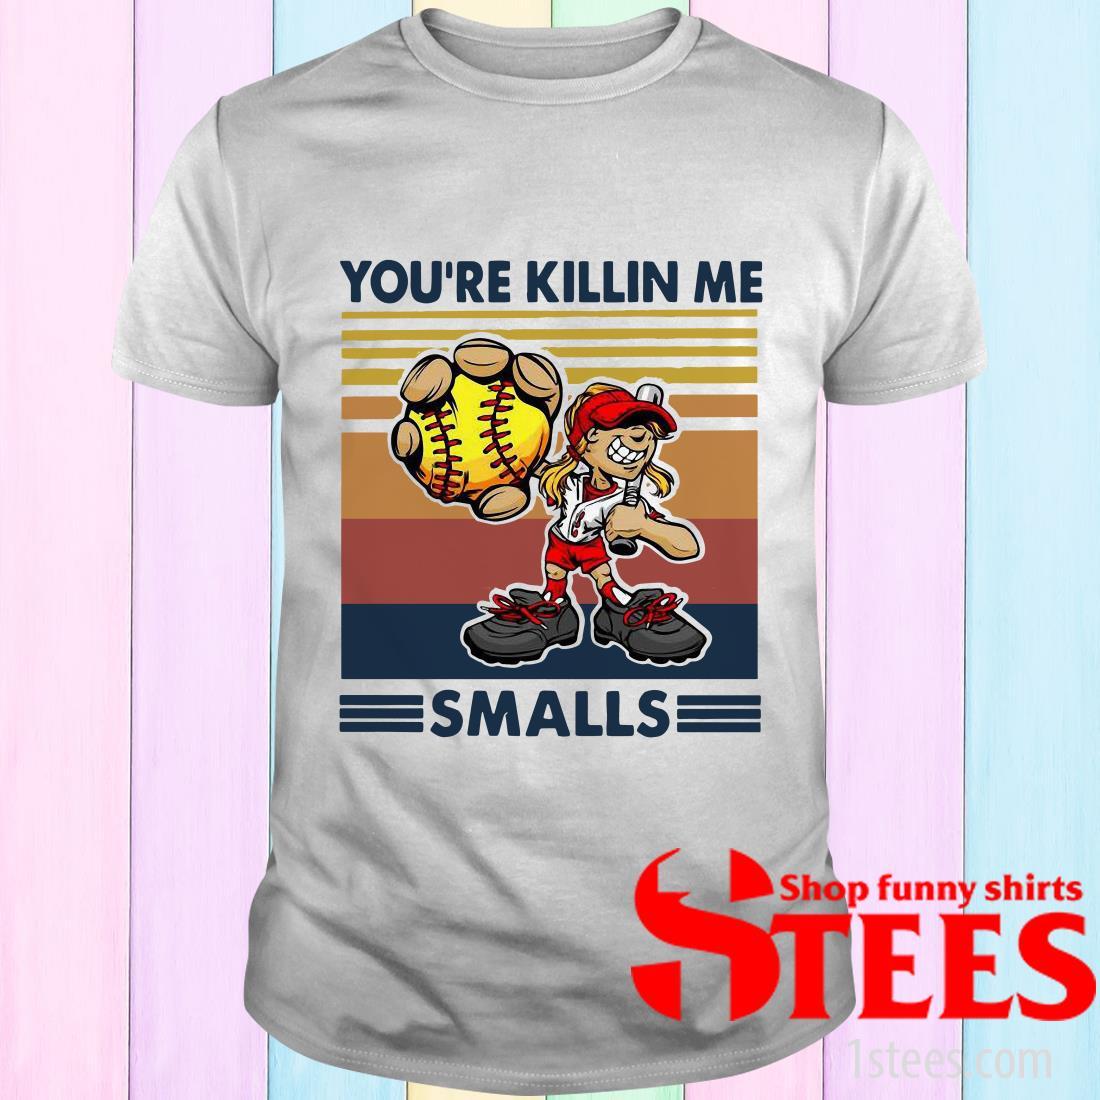 Softball Girl Cartoon Player You're Killin Me Smalls Vintage T-Shirt